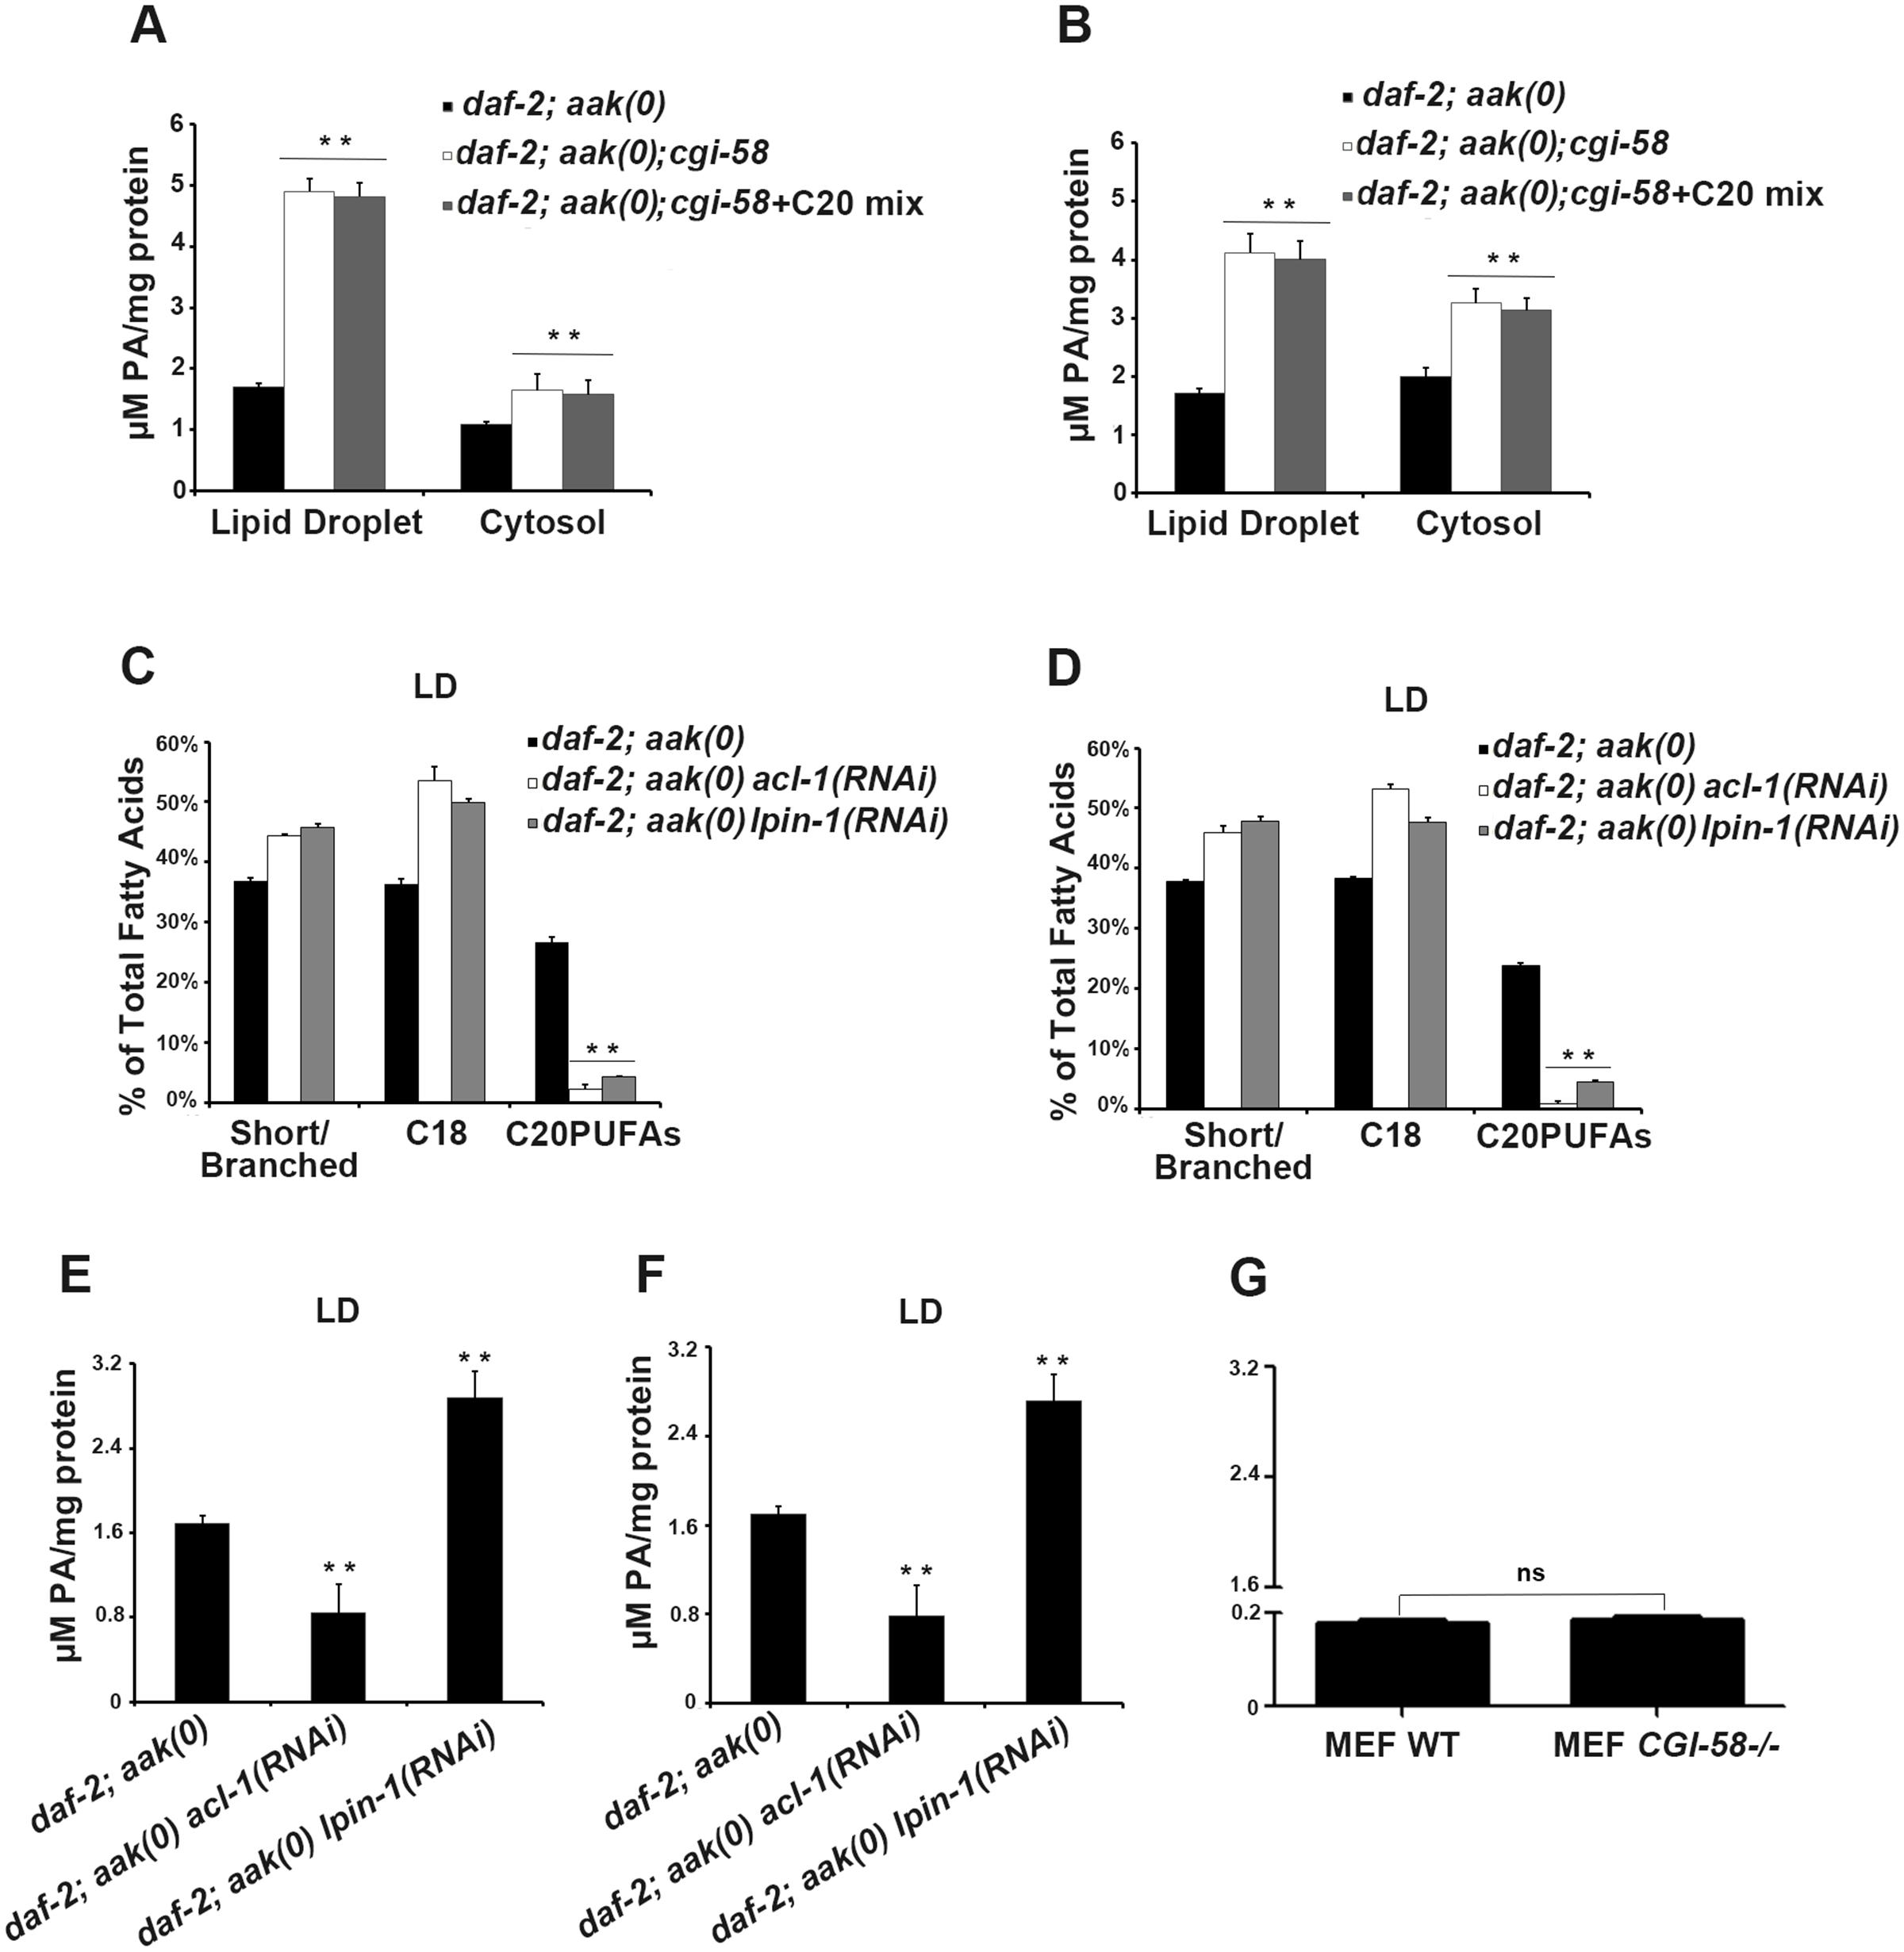 Variation in phosphatidic acid (PA) levels is associated with reduced C20PUFA abundance.